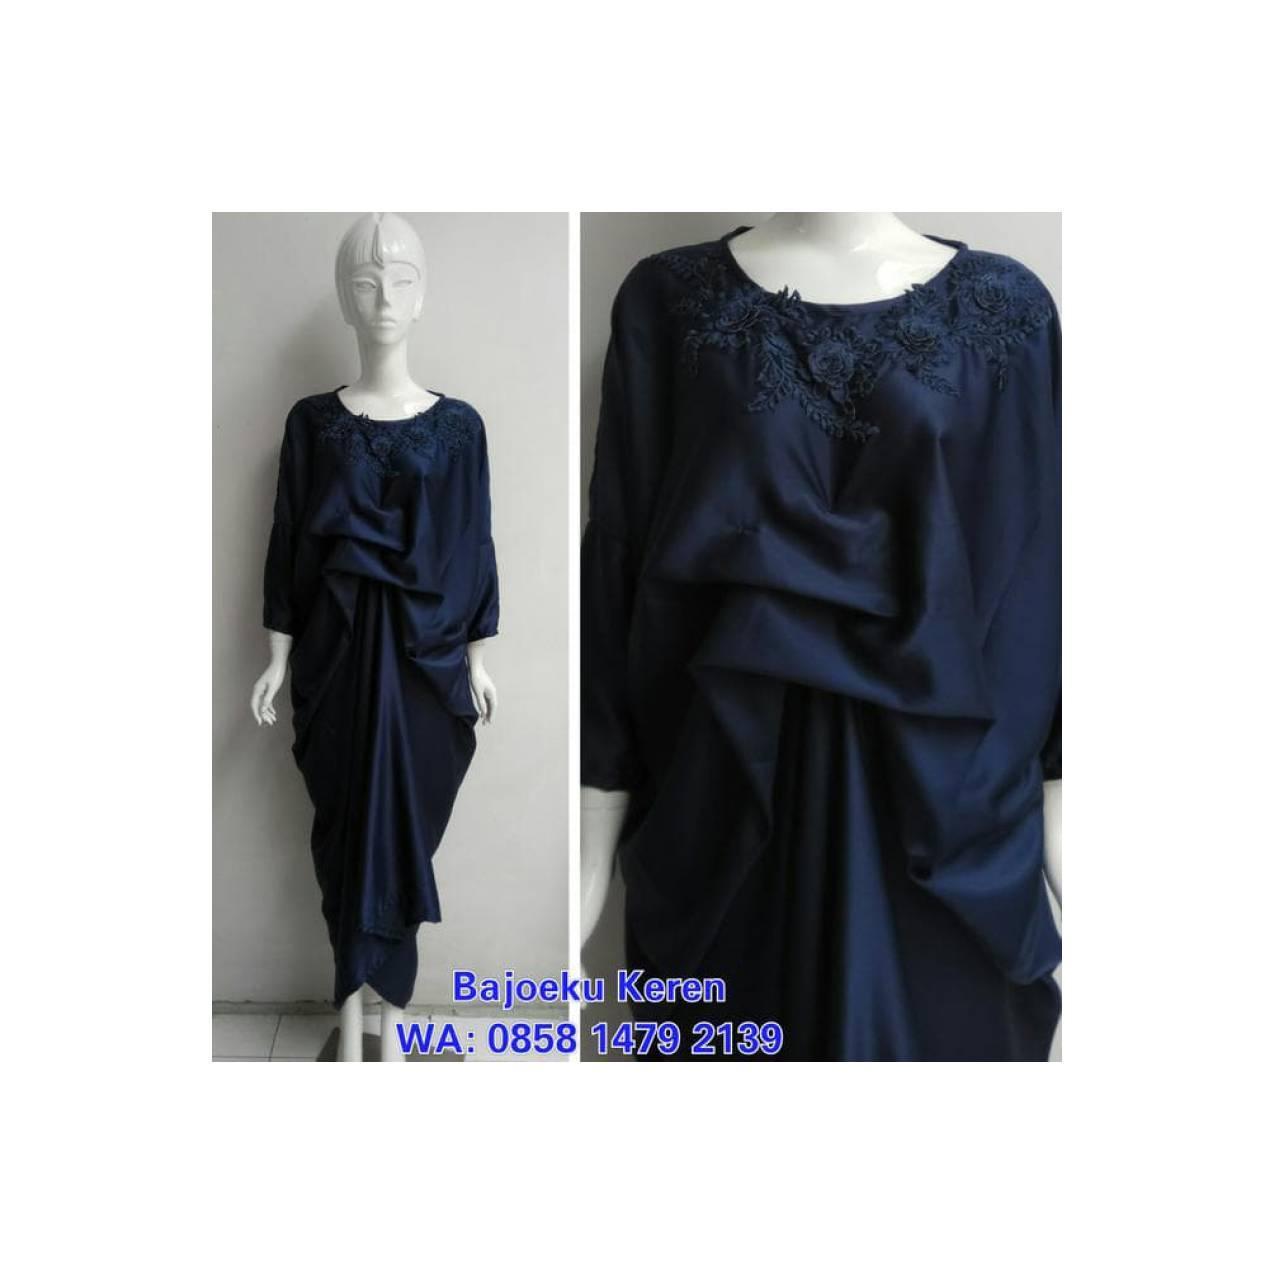 Promo Kaftan Long Dress Maxi Dress Kebaya Modern Gamisjasa Jahit Bukan